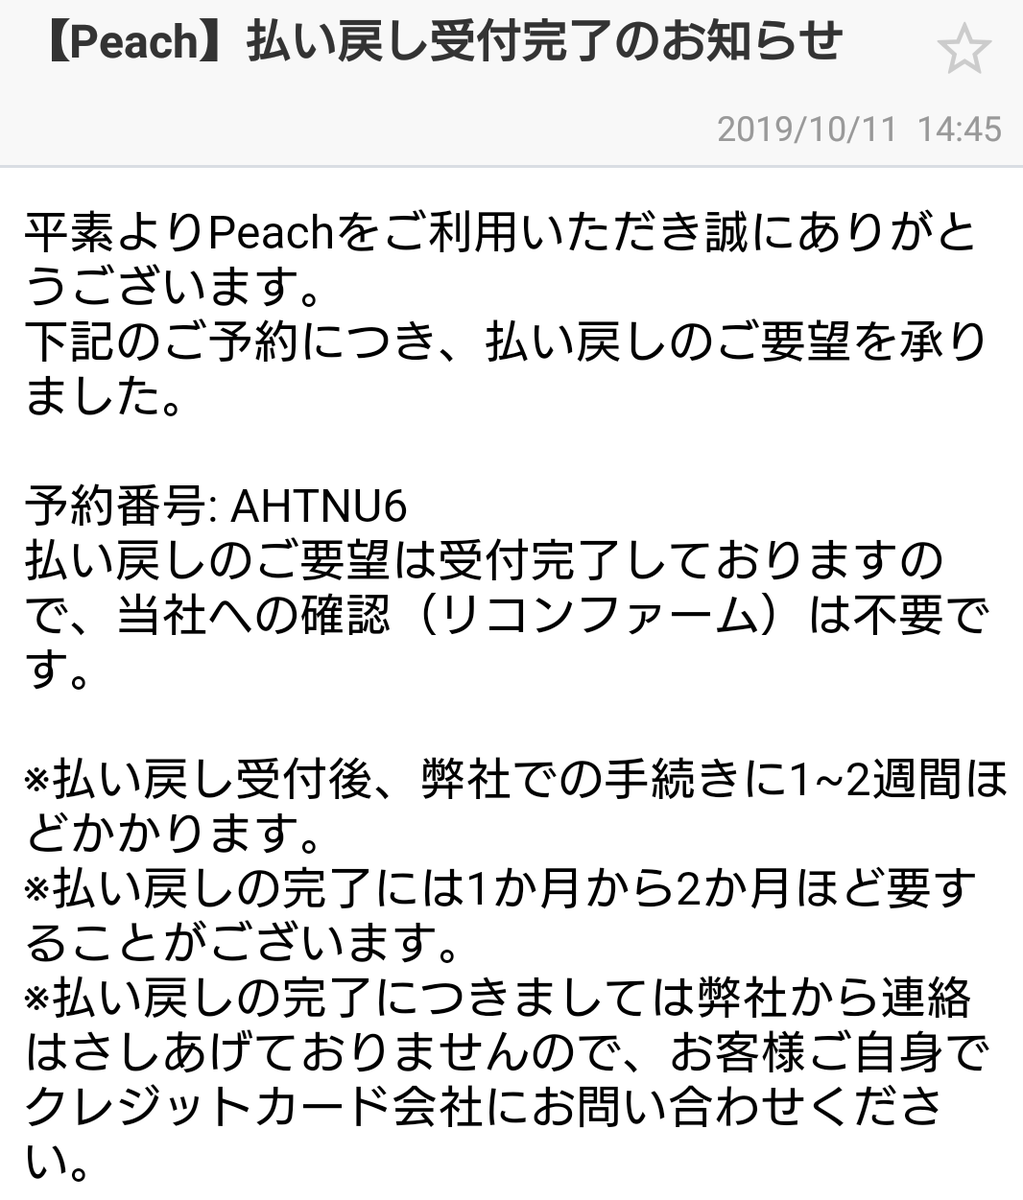 f:id:Kinokawaryokusan:20191012063656p:plain